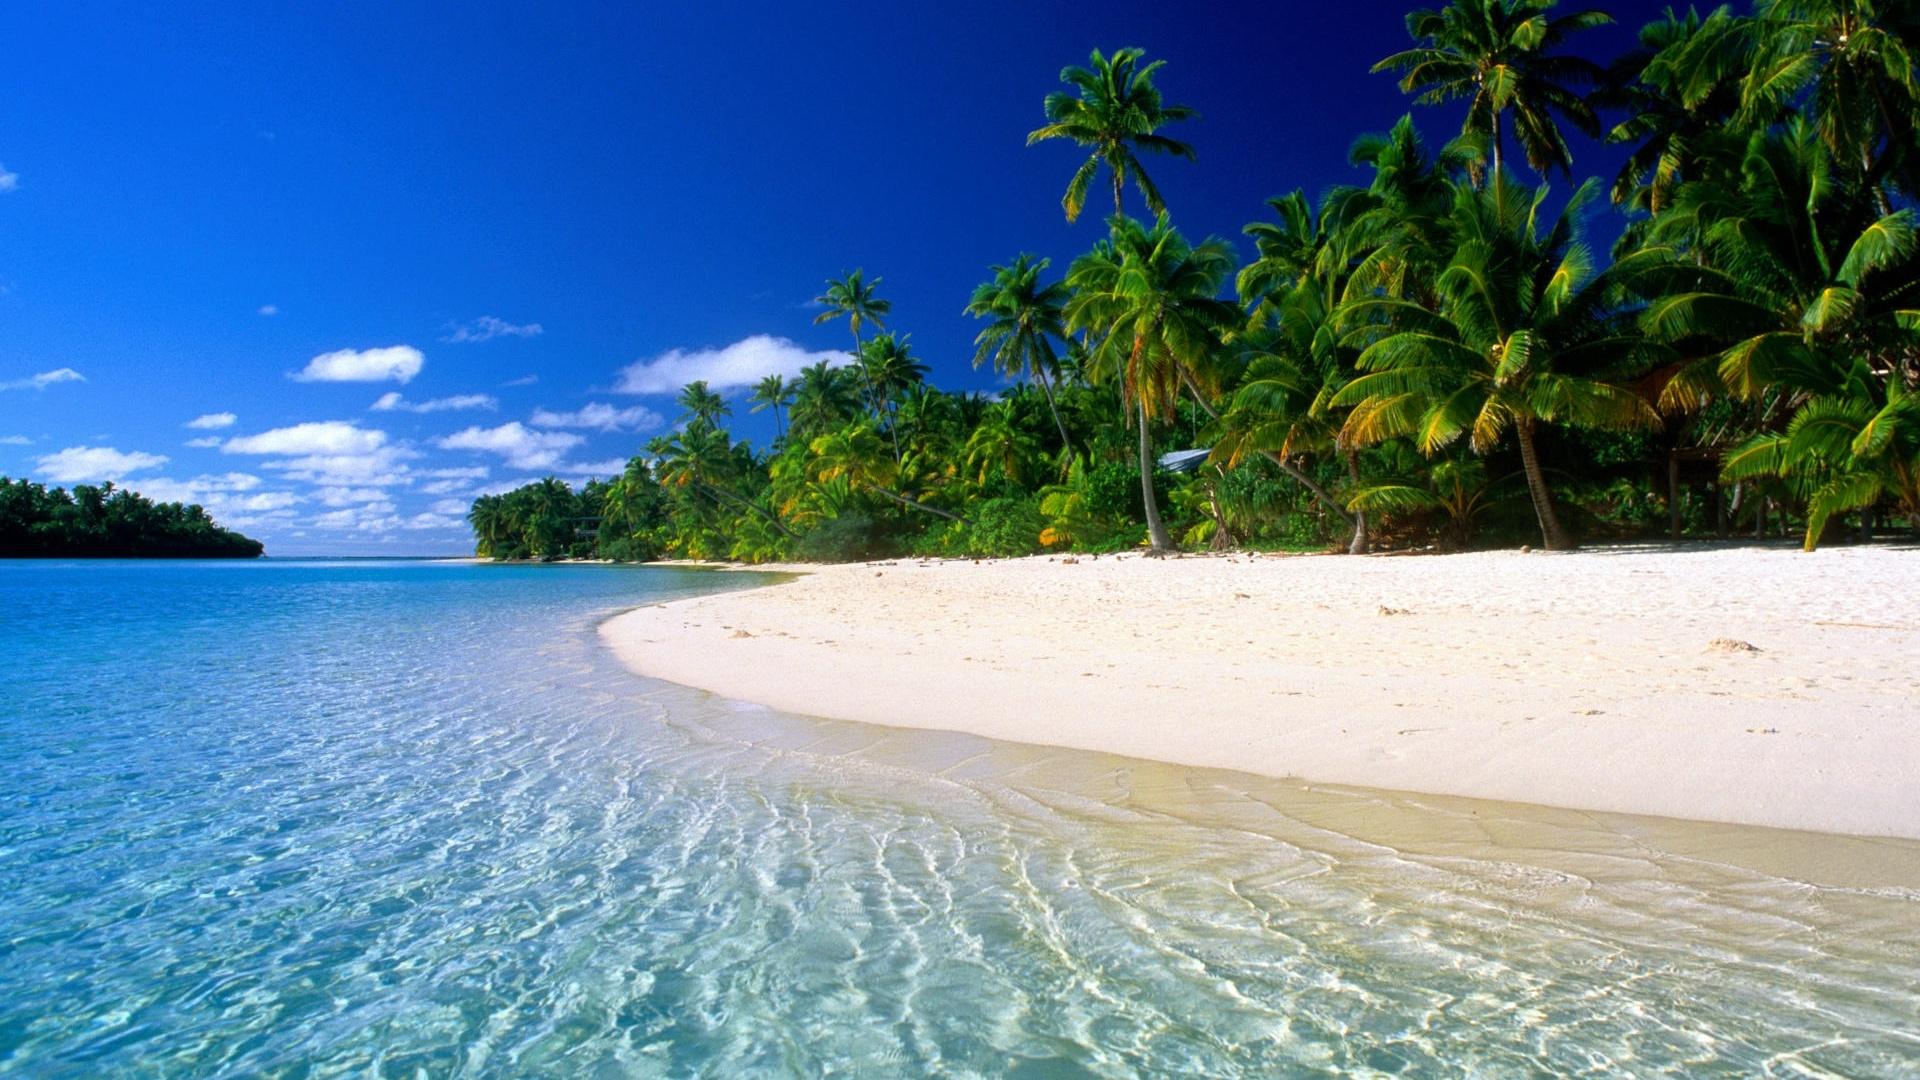 Beautiful HD Beach 1   Beautiful Dream Beach 1920x1080